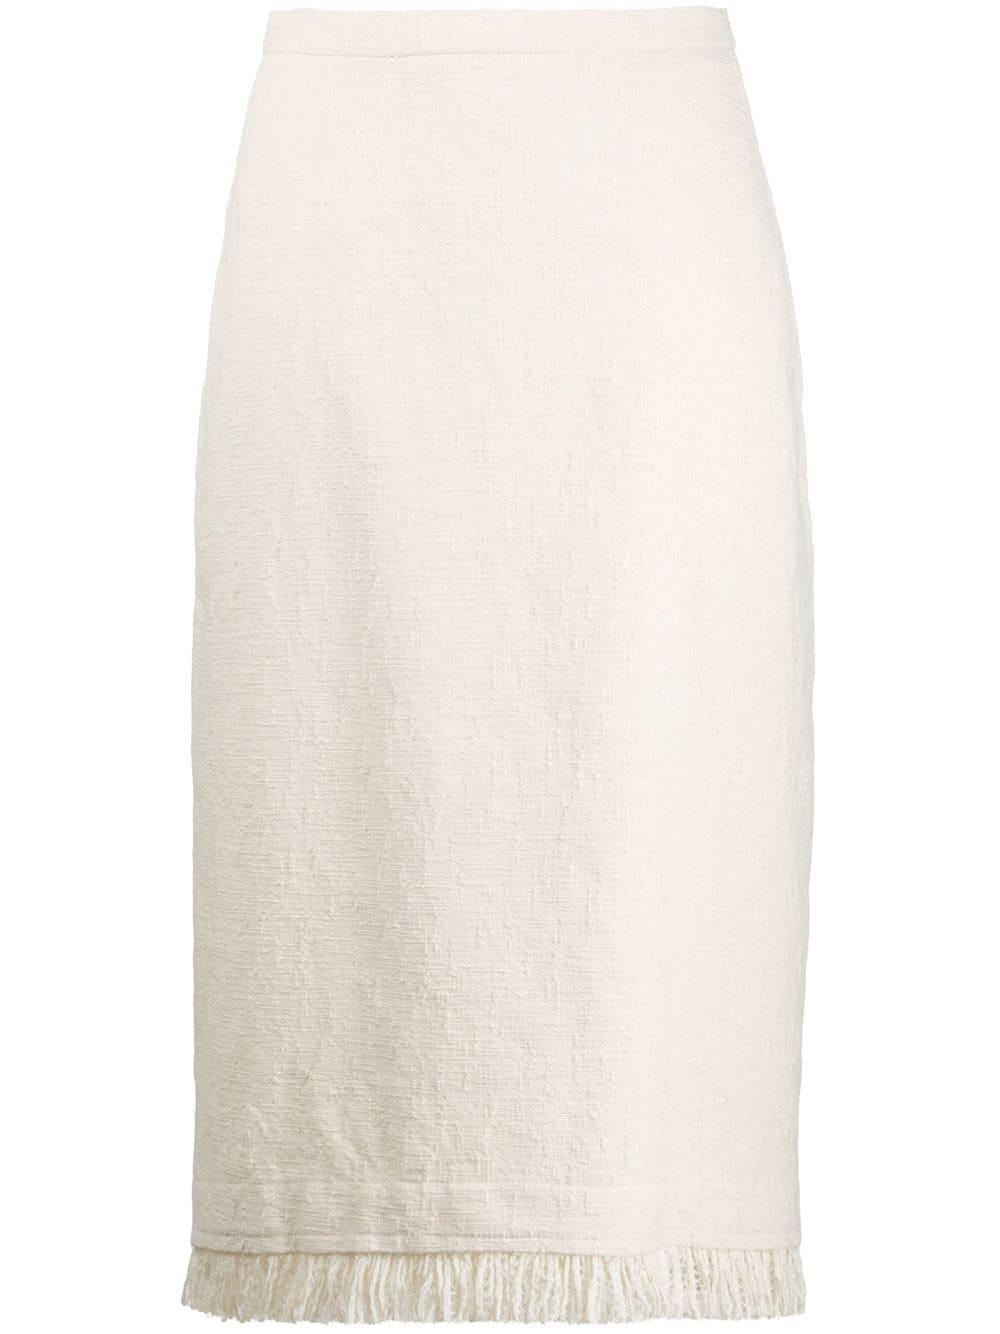 Touch Of Summer Skirt Item # 740405-C